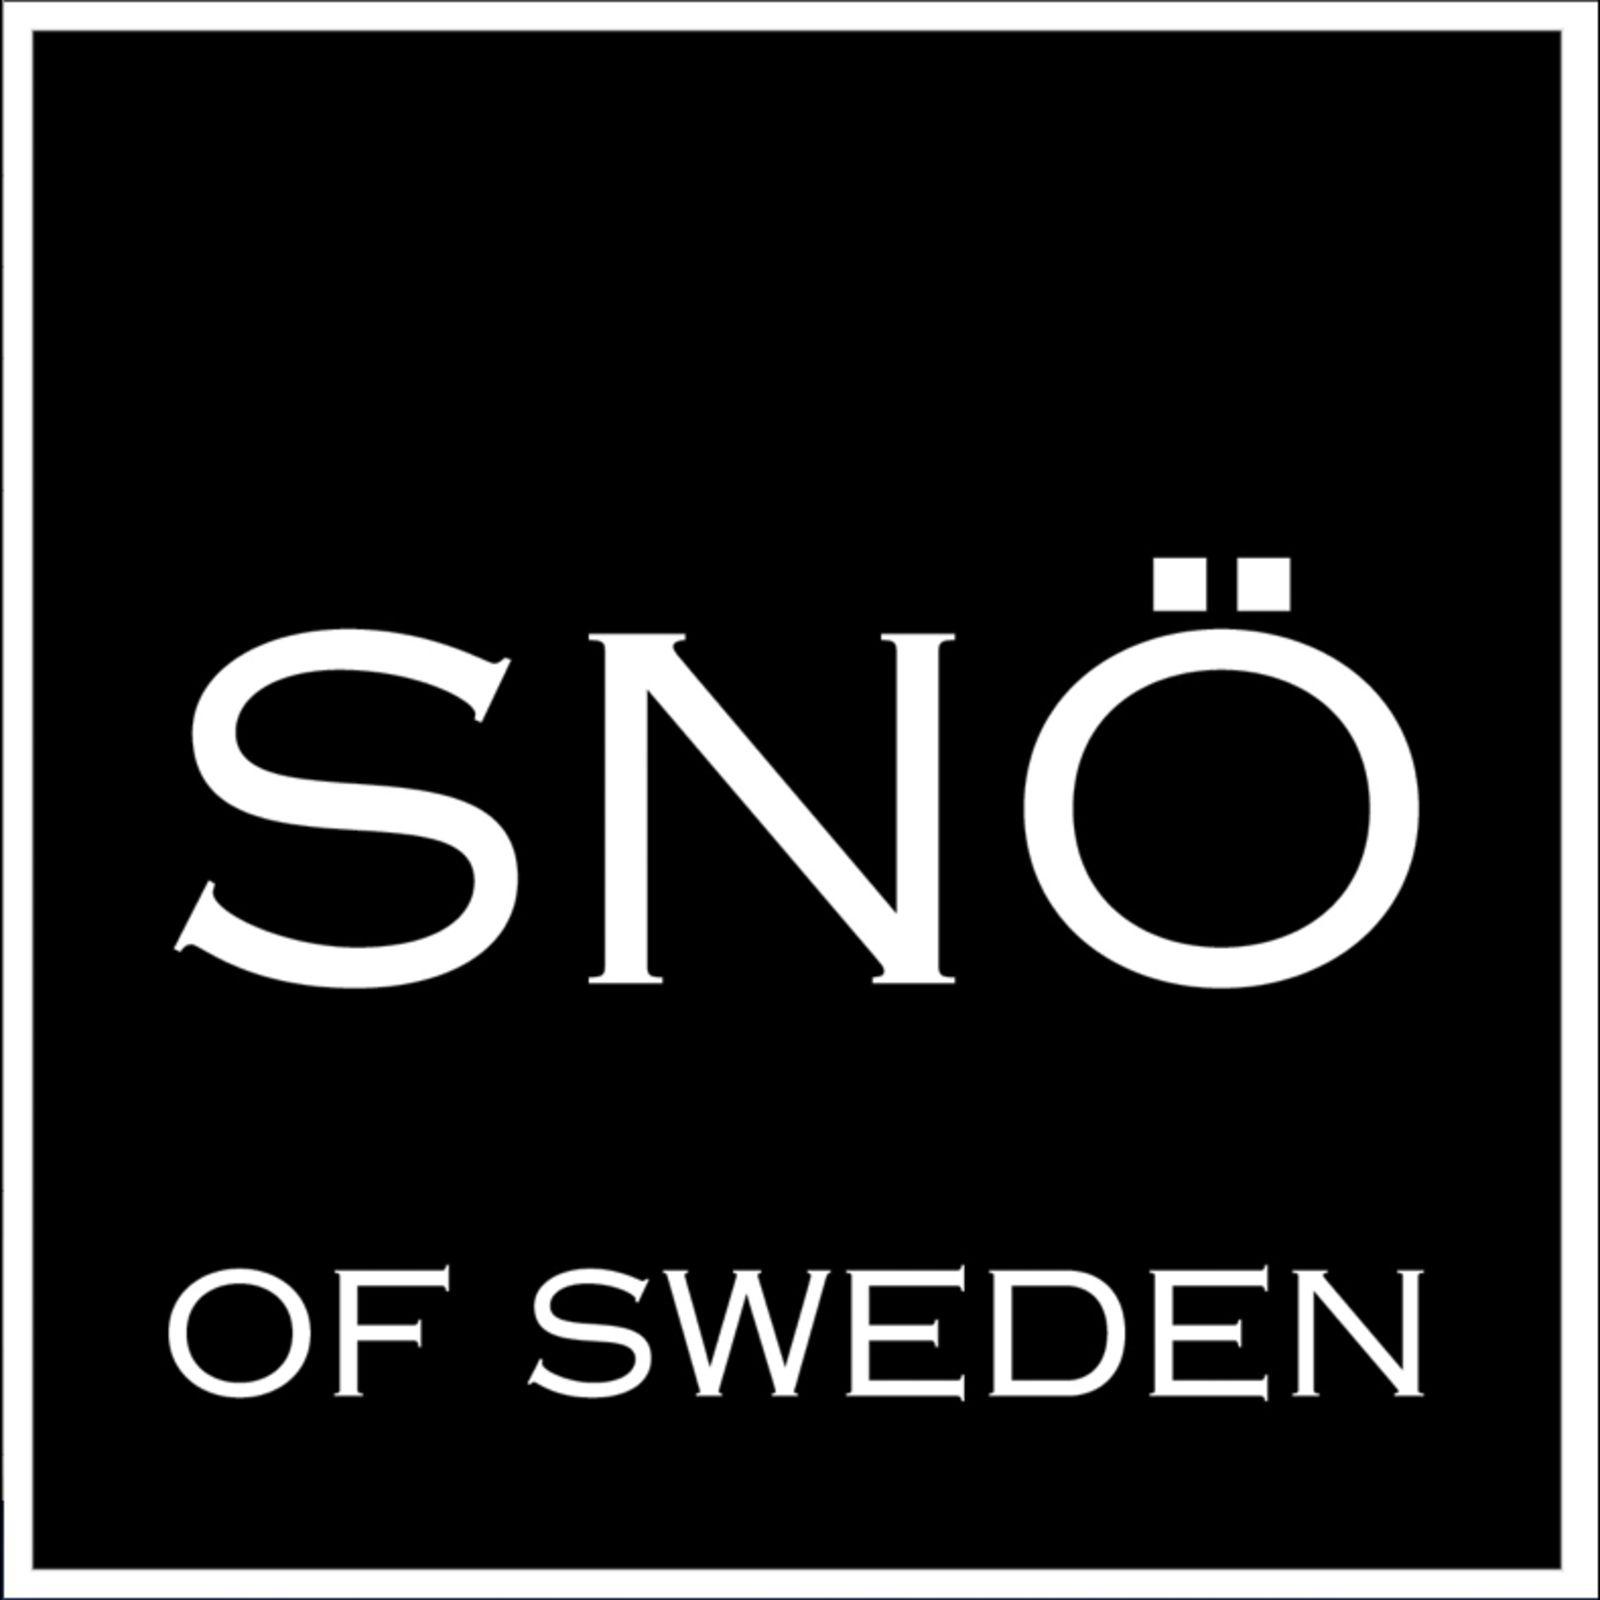 SNÖ OF SWEDEN (Bild 1)